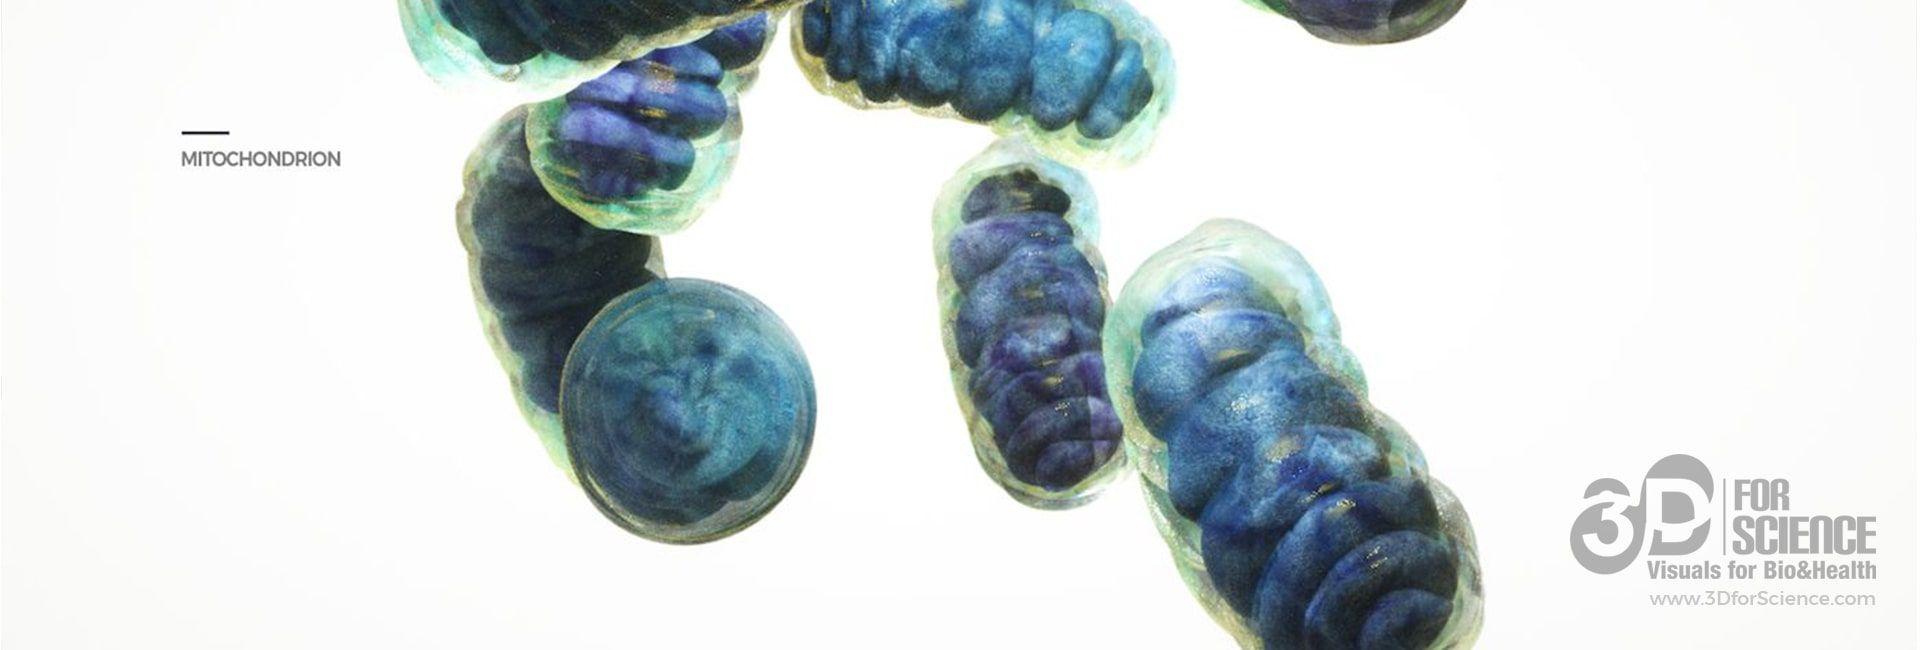 mAbxience biosimilar medicines